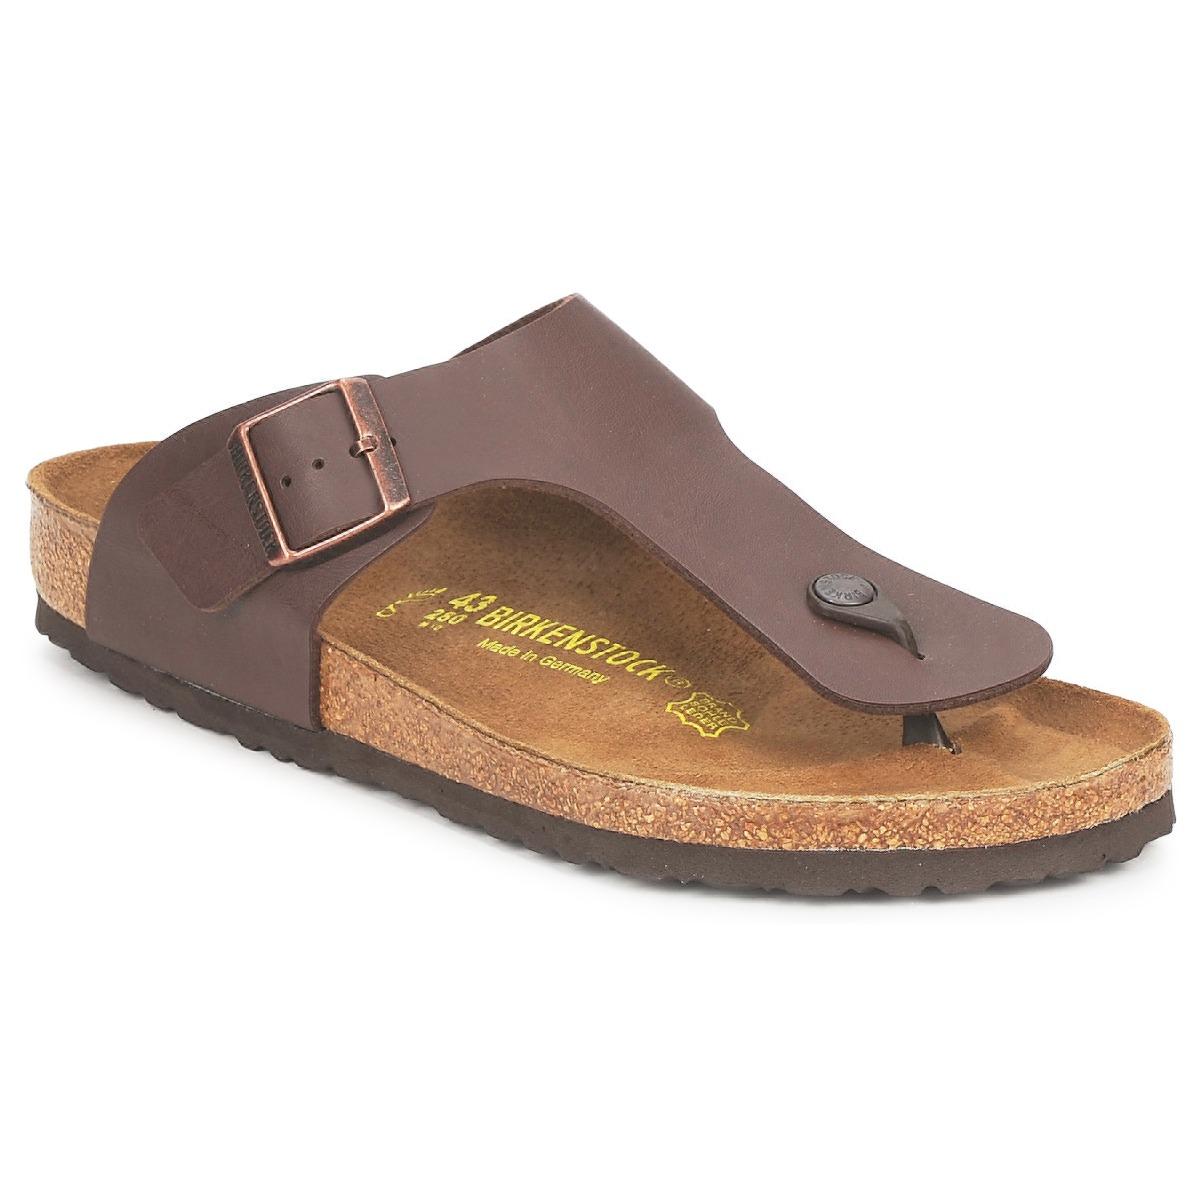 518b828b0 Birkenstock Florida Soft Footbed Narrow Shoe 22